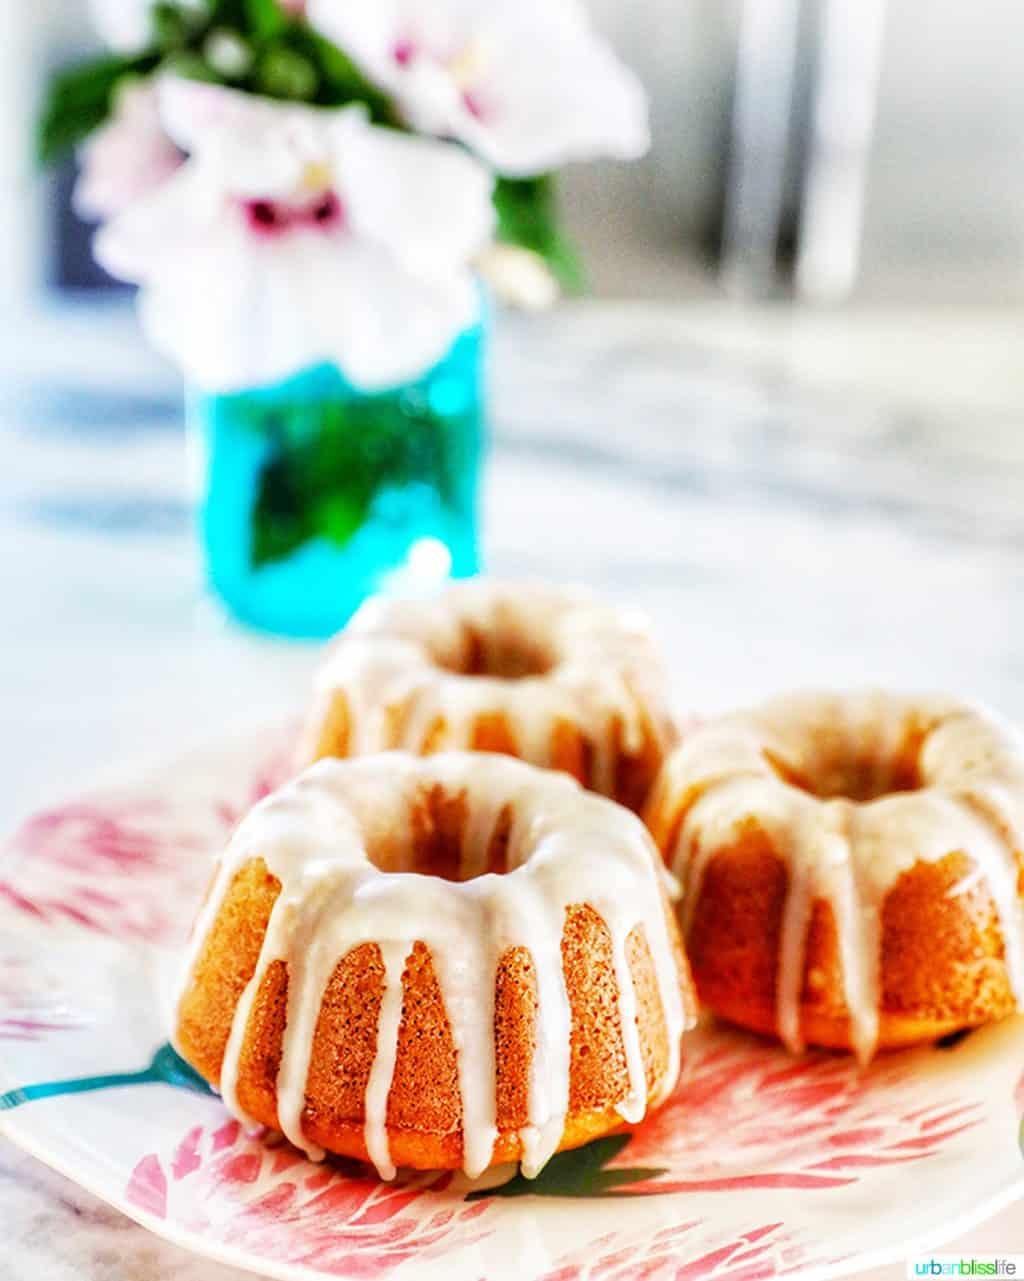 straight-on angle of three mini bundt cakes with citrus